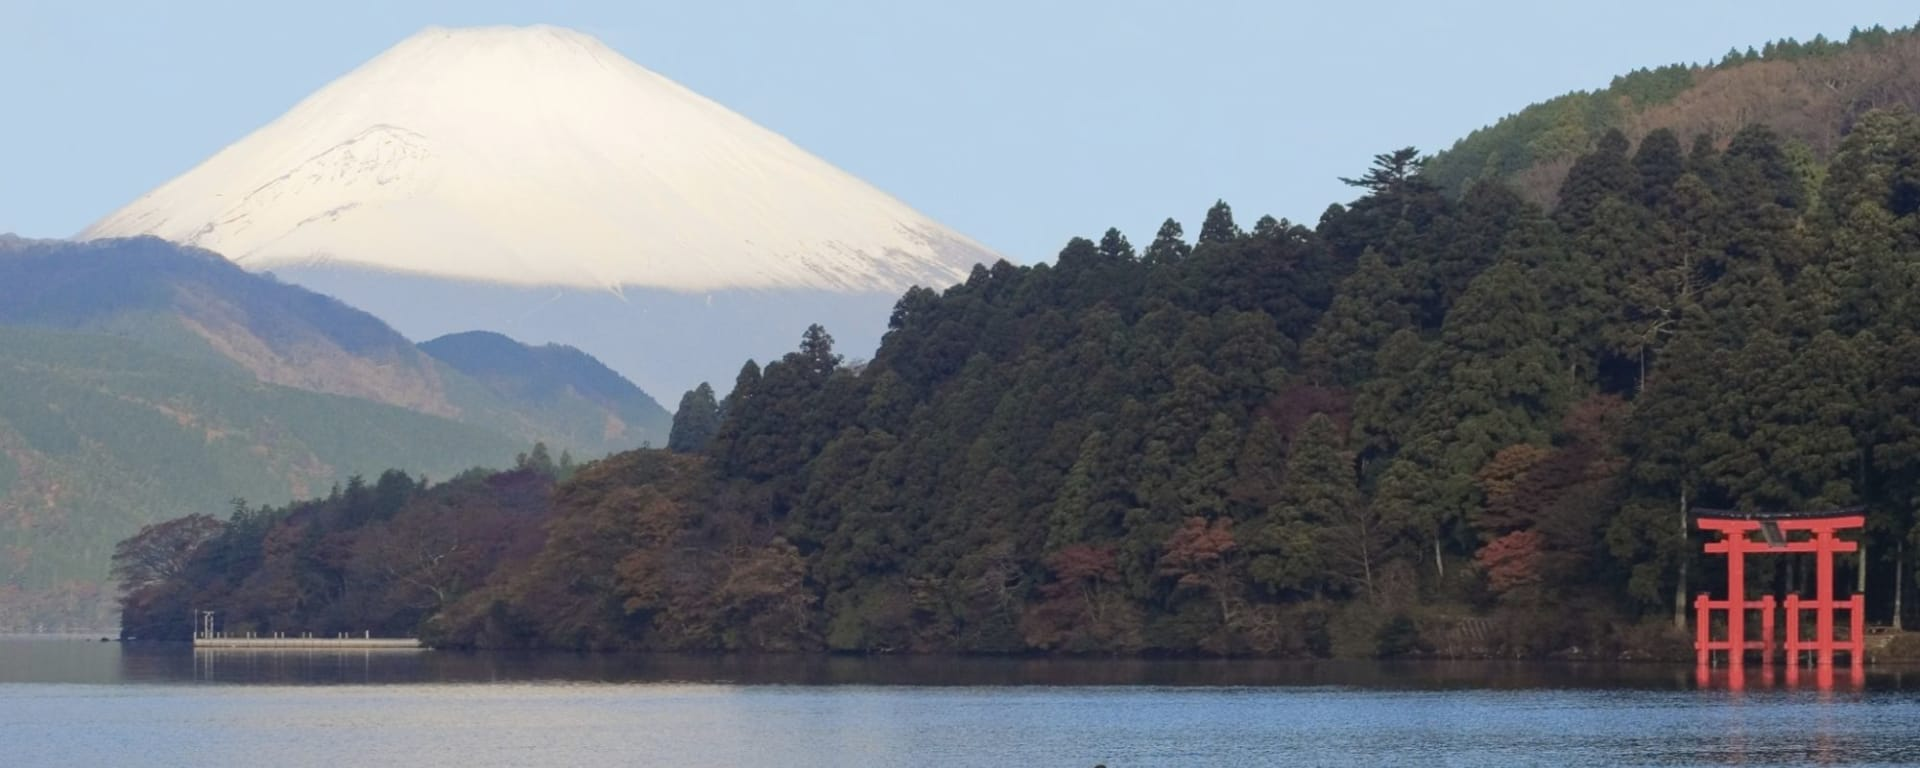 Klassisches Japan ab Tokio: Mt. Fuji: with lake